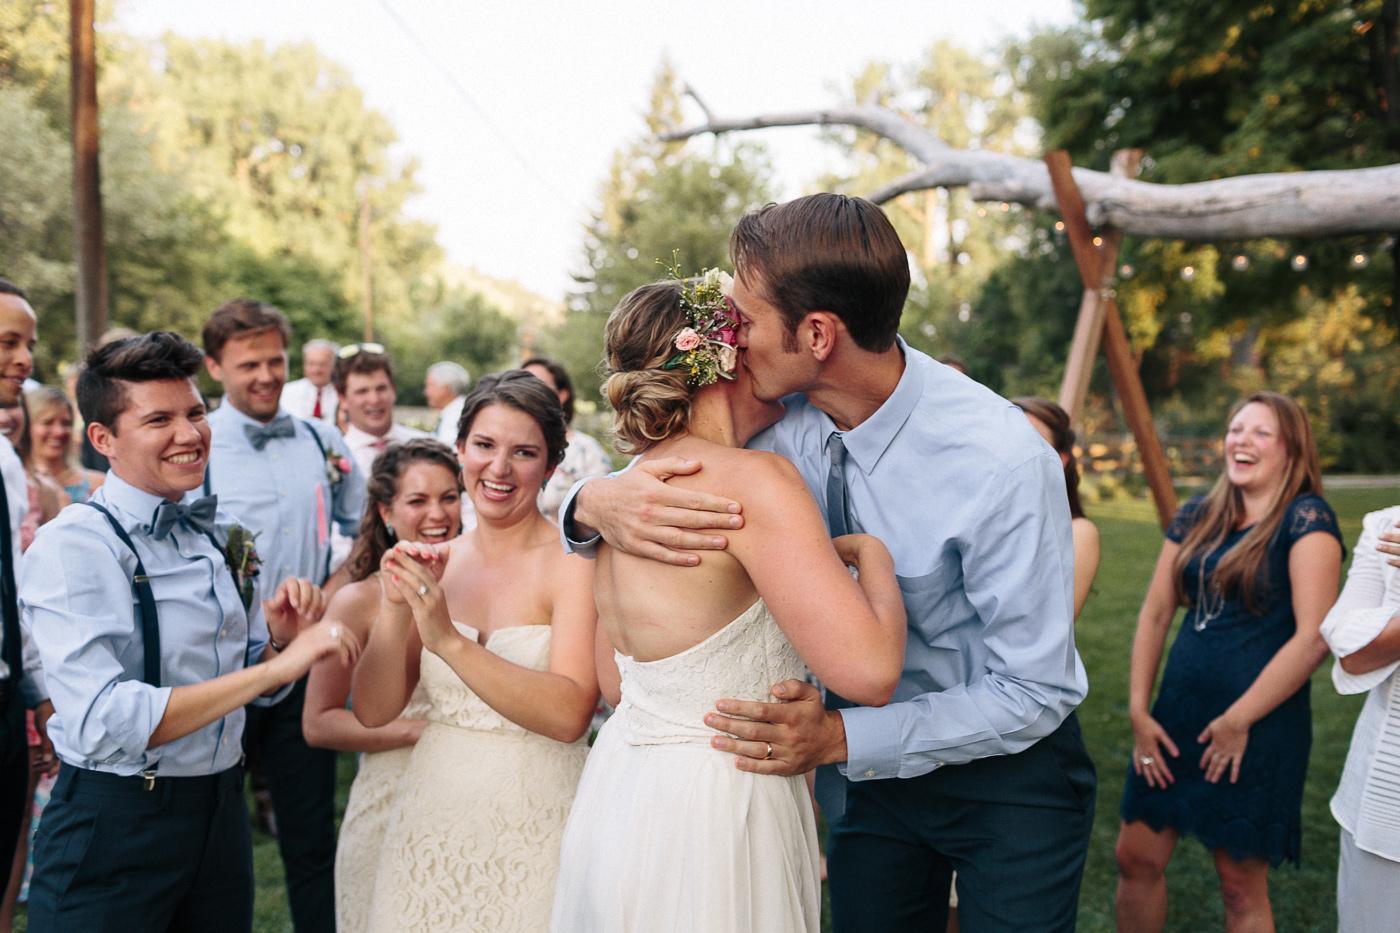 Lyons-Farmette-Wedding-Photographer-Lucy-Austin-Flash-Mob-Dance-55.jpg